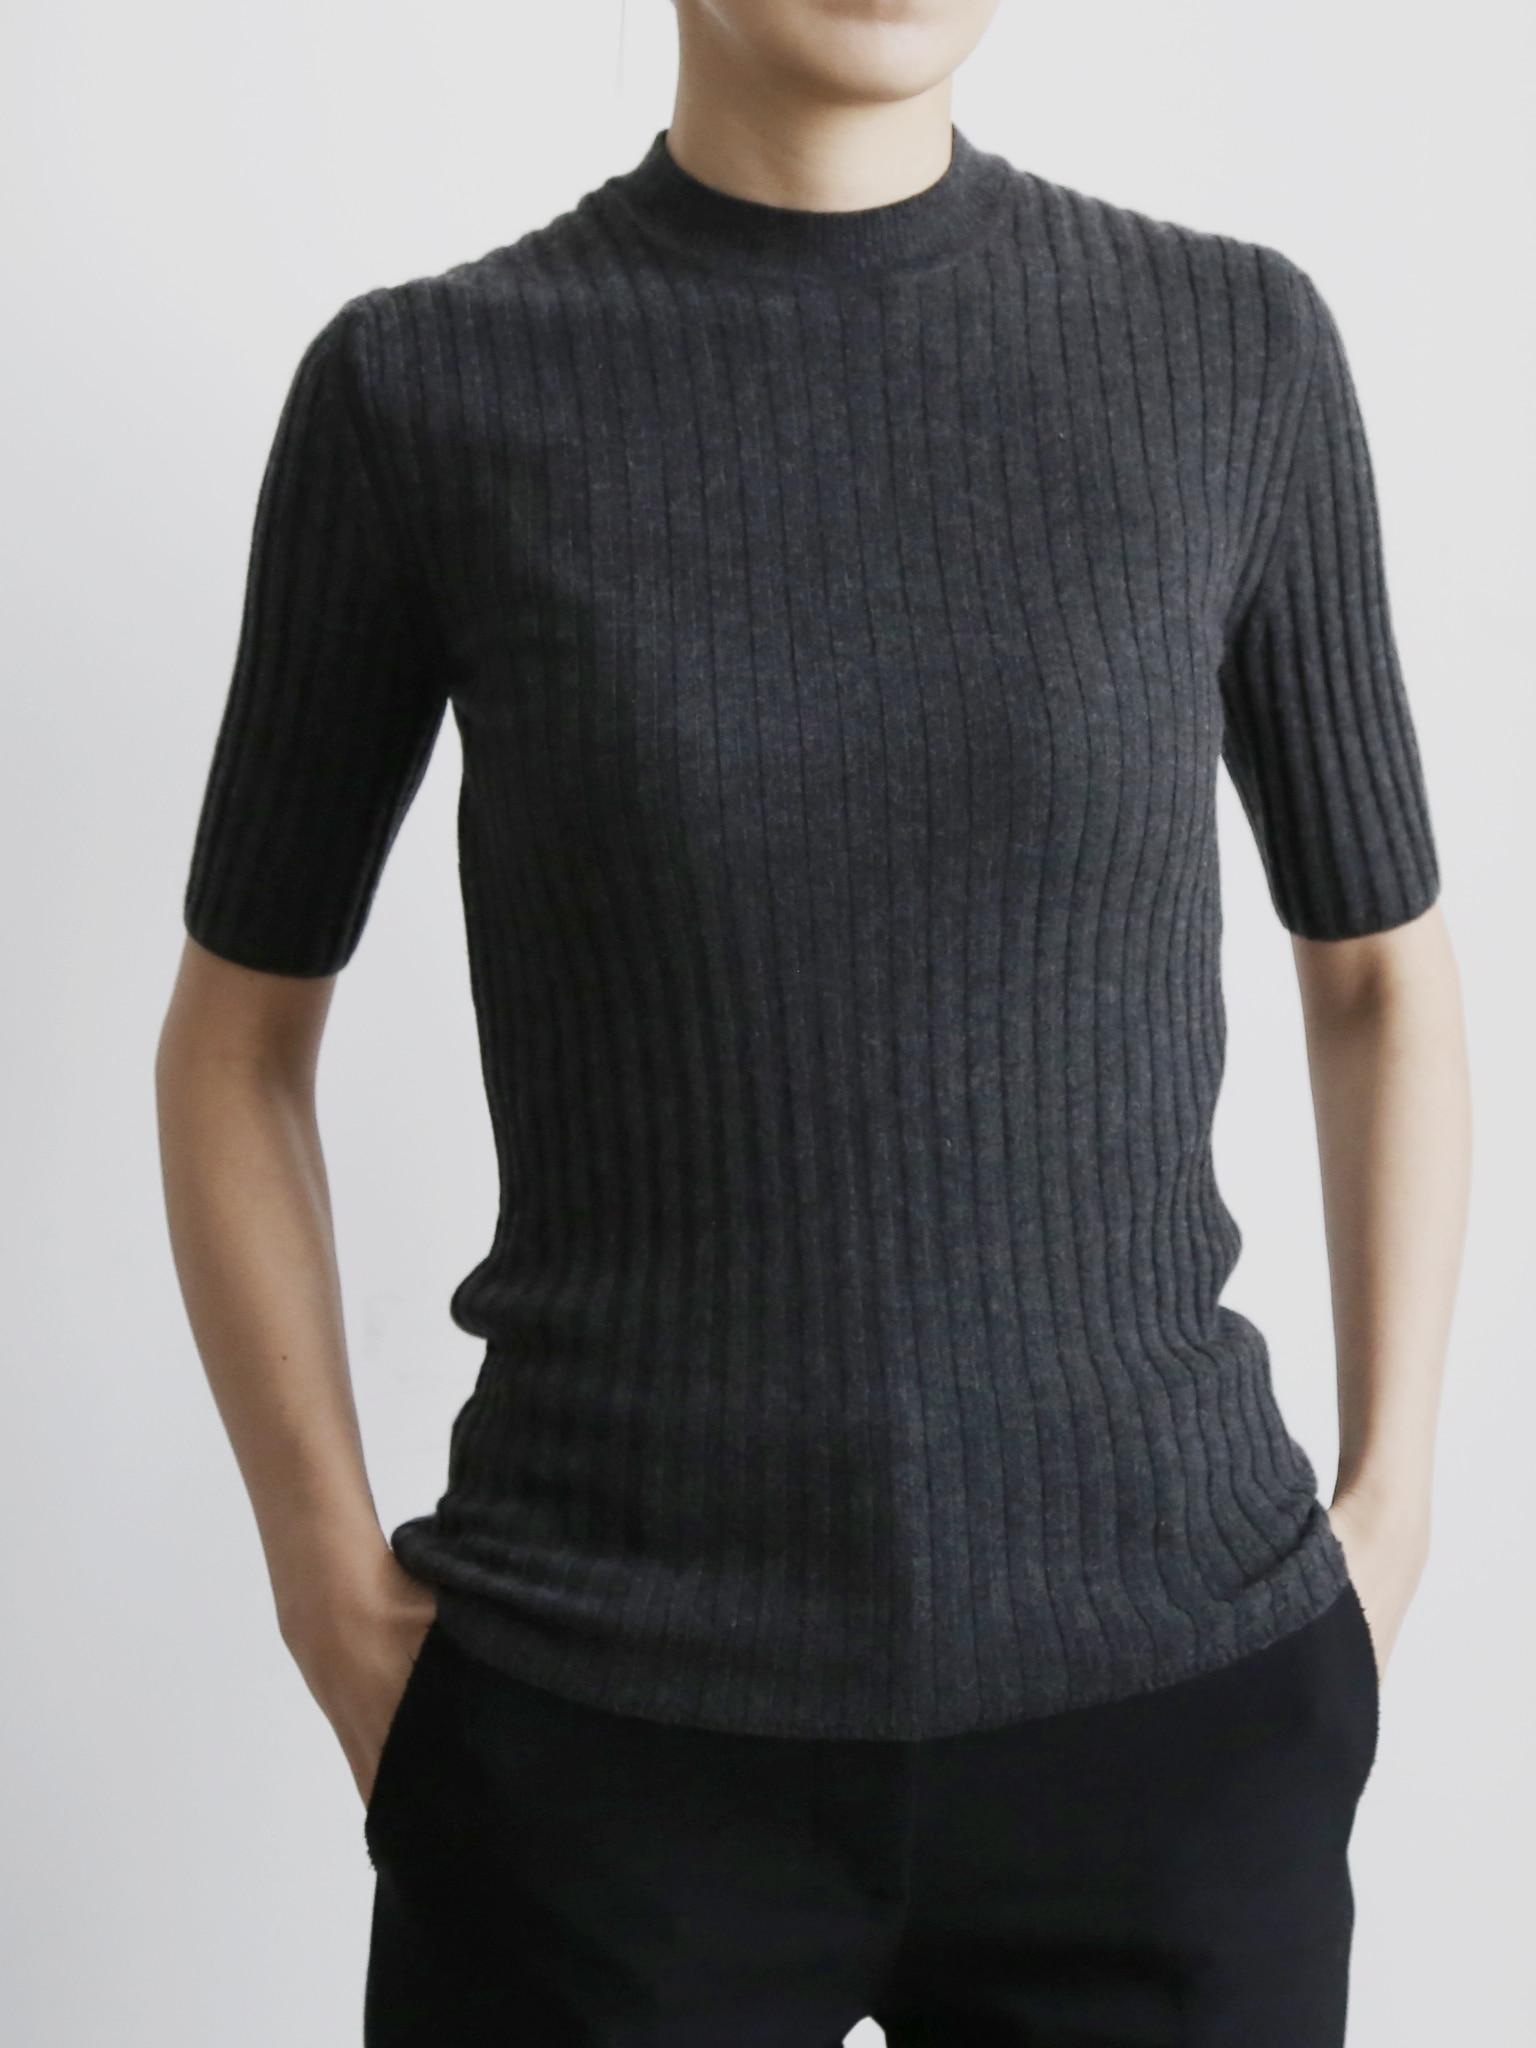 ROYAL Collection. Loro Piana Cashmere 100%Short sleeve Rib Pullover